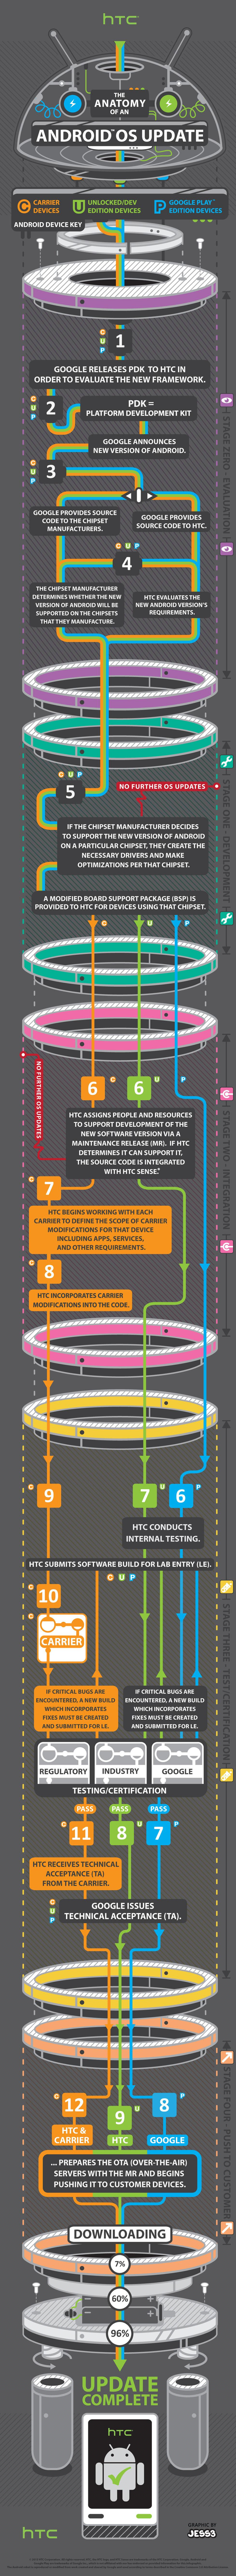 htc update infographic